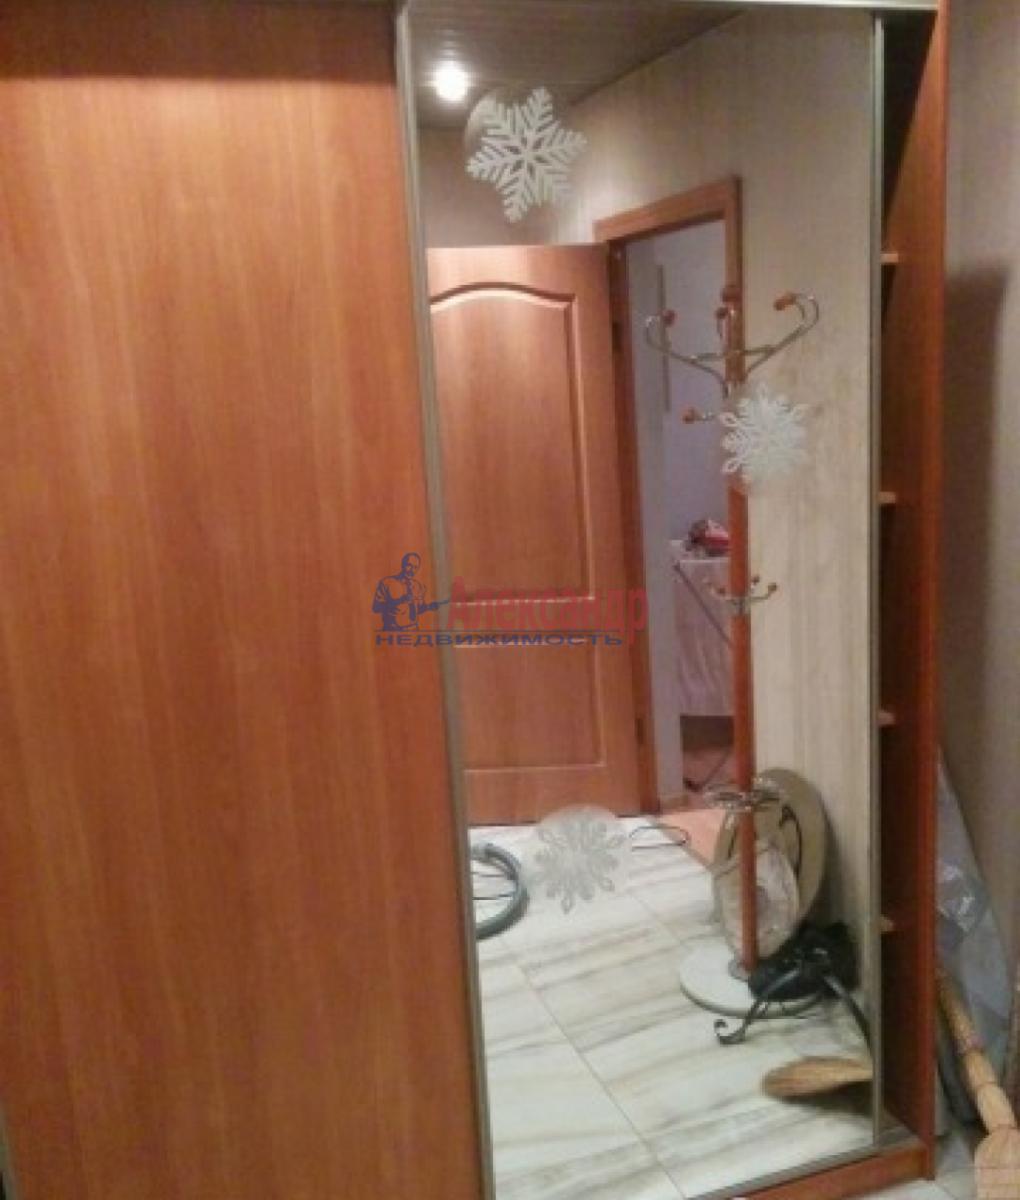 3-комнатная квартира (80м2) в аренду по адресу Ленинский пр., 118— фото 6 из 10